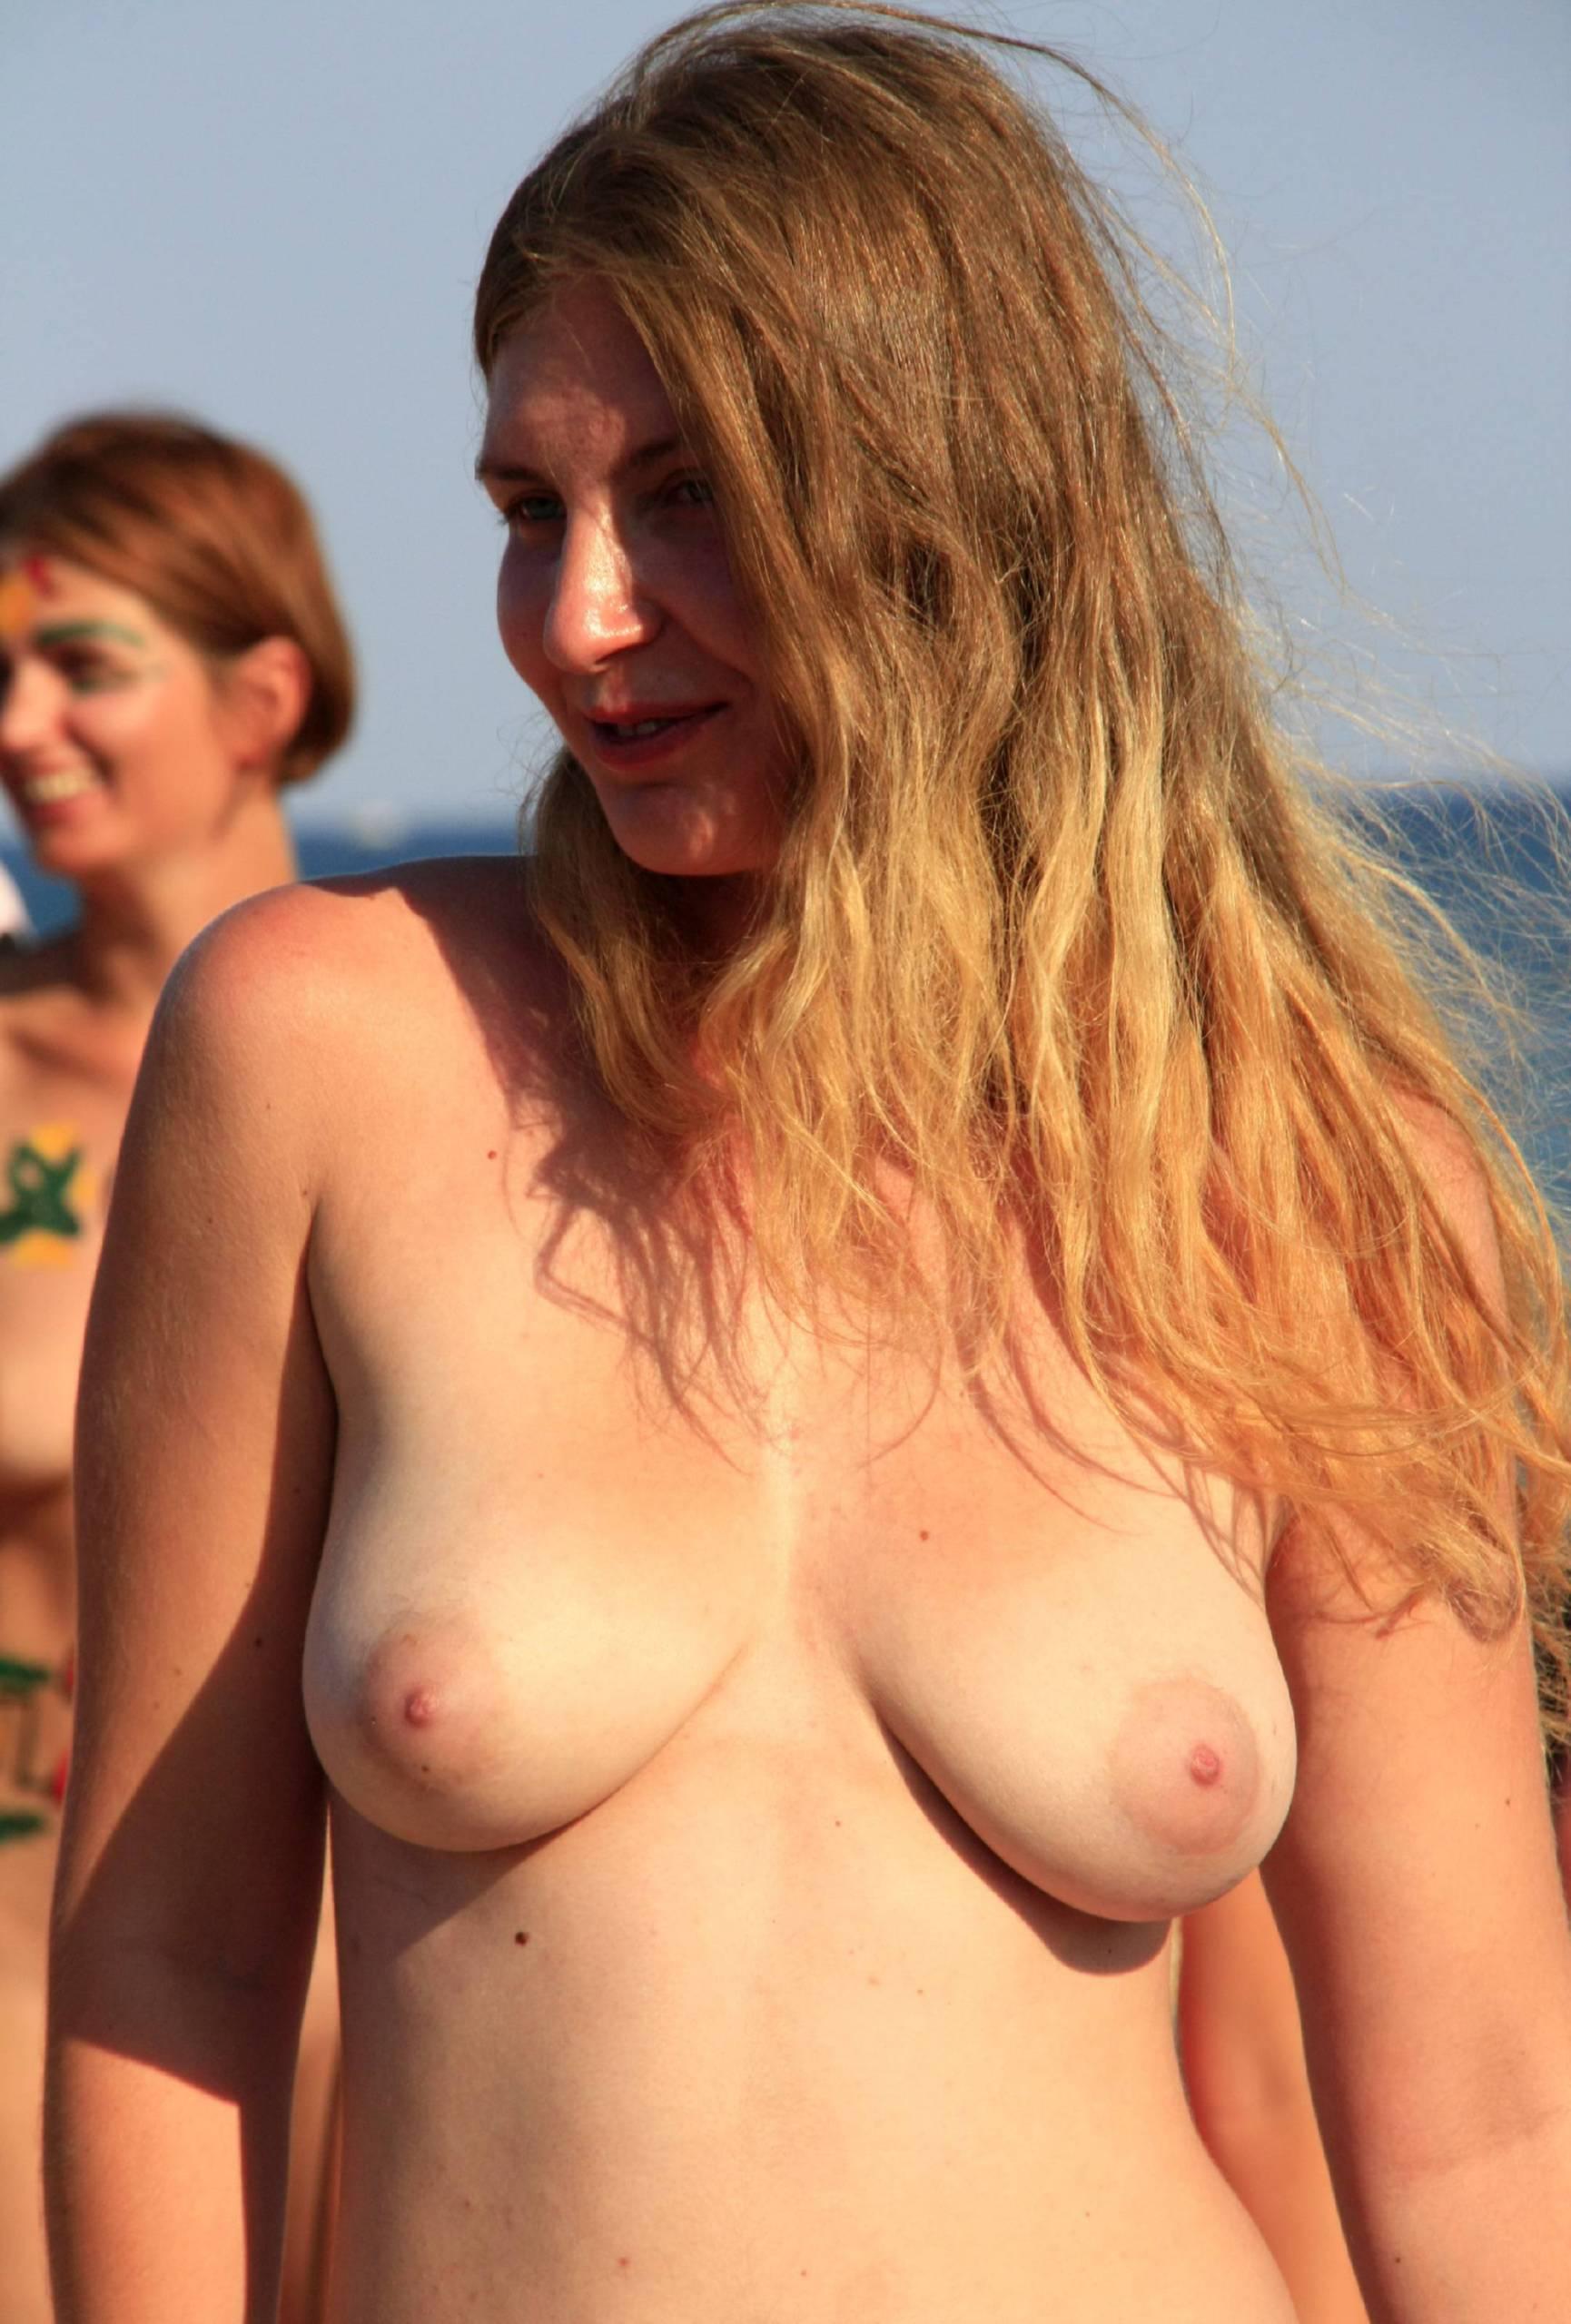 Pure Nudism Nude Group Beach Profile - 2